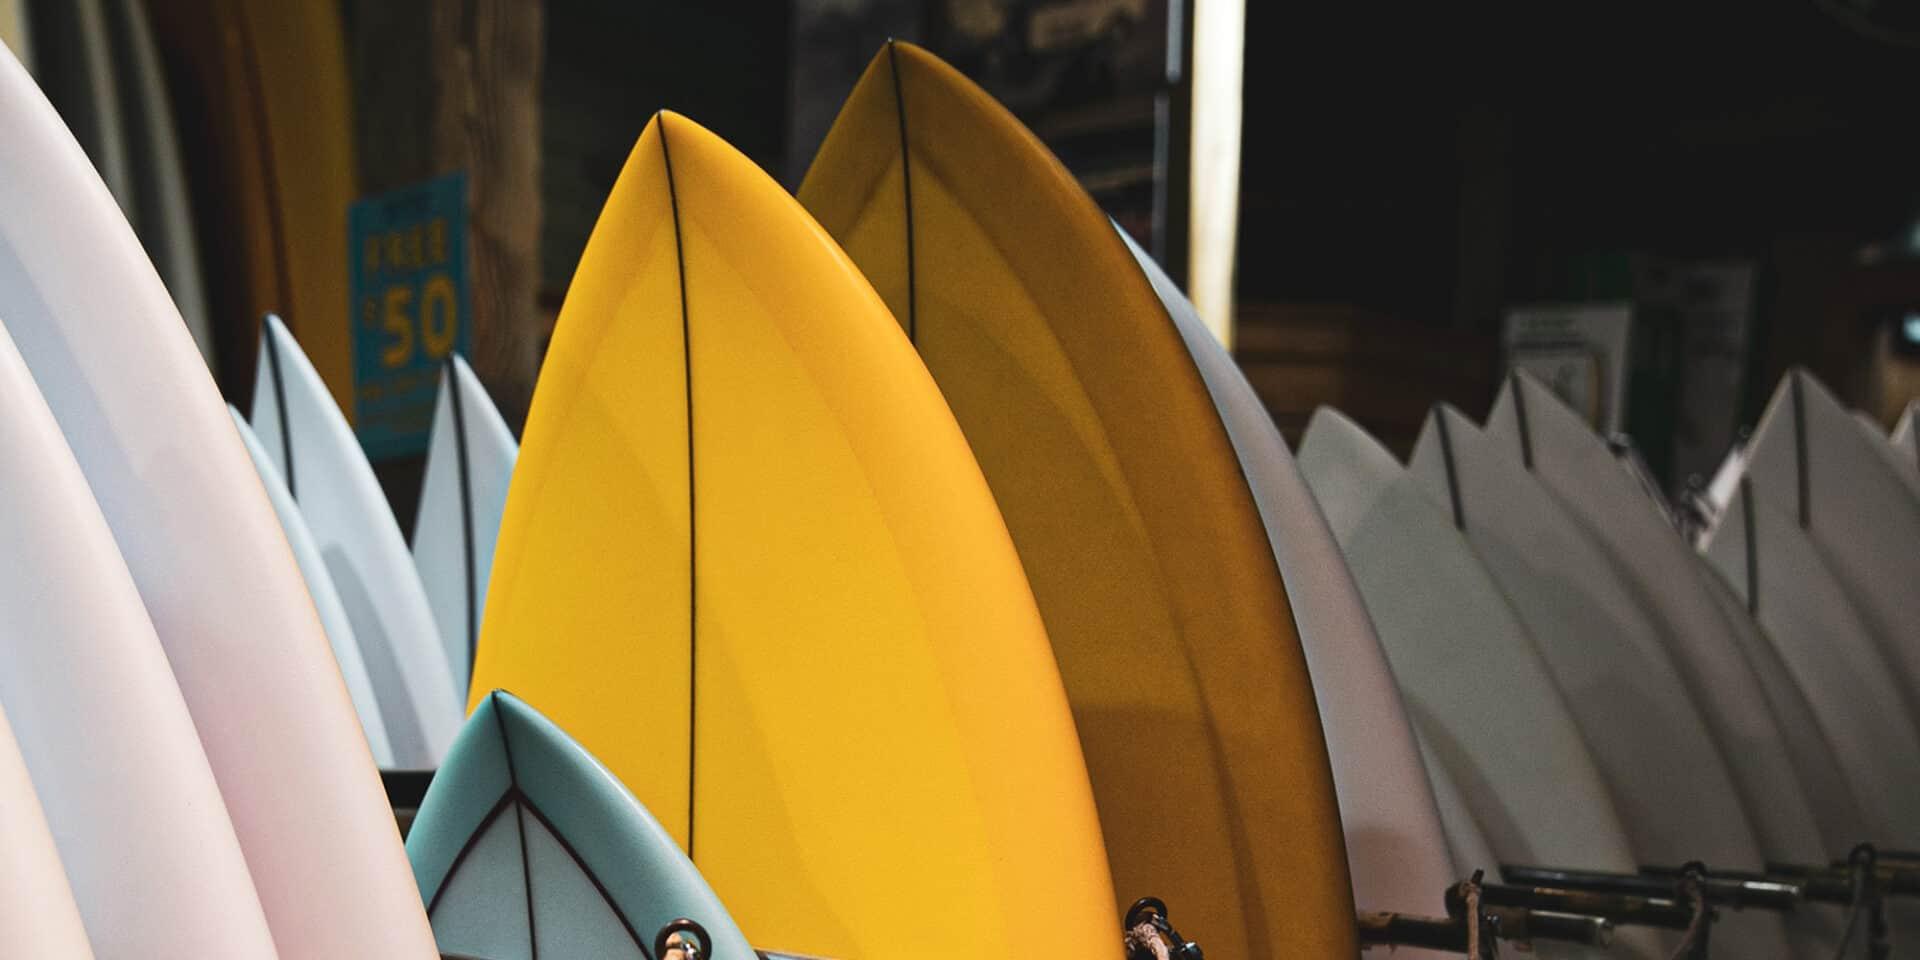 surfboard shapes surfboard guide longboard shortboard mini mal groveller egg fish